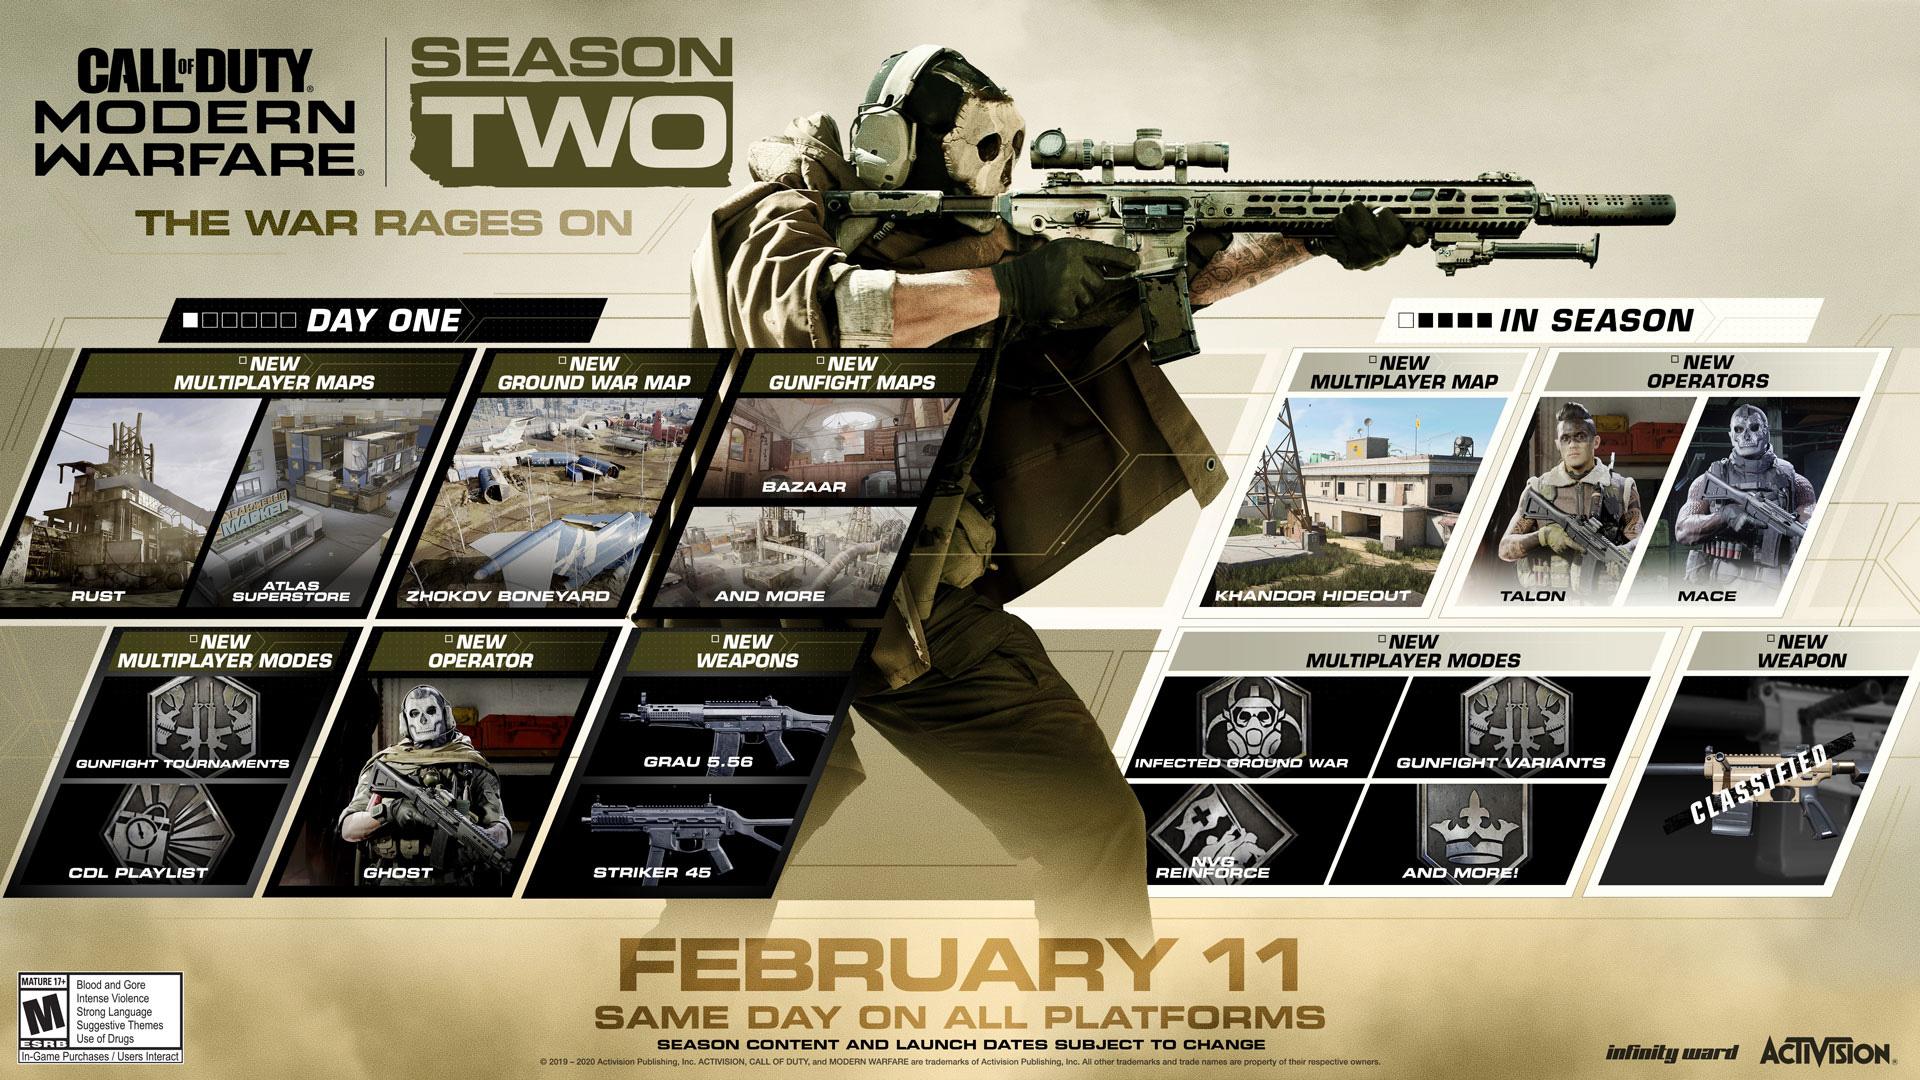 Call of Duty: Modern Warfare Season 2 update schedule